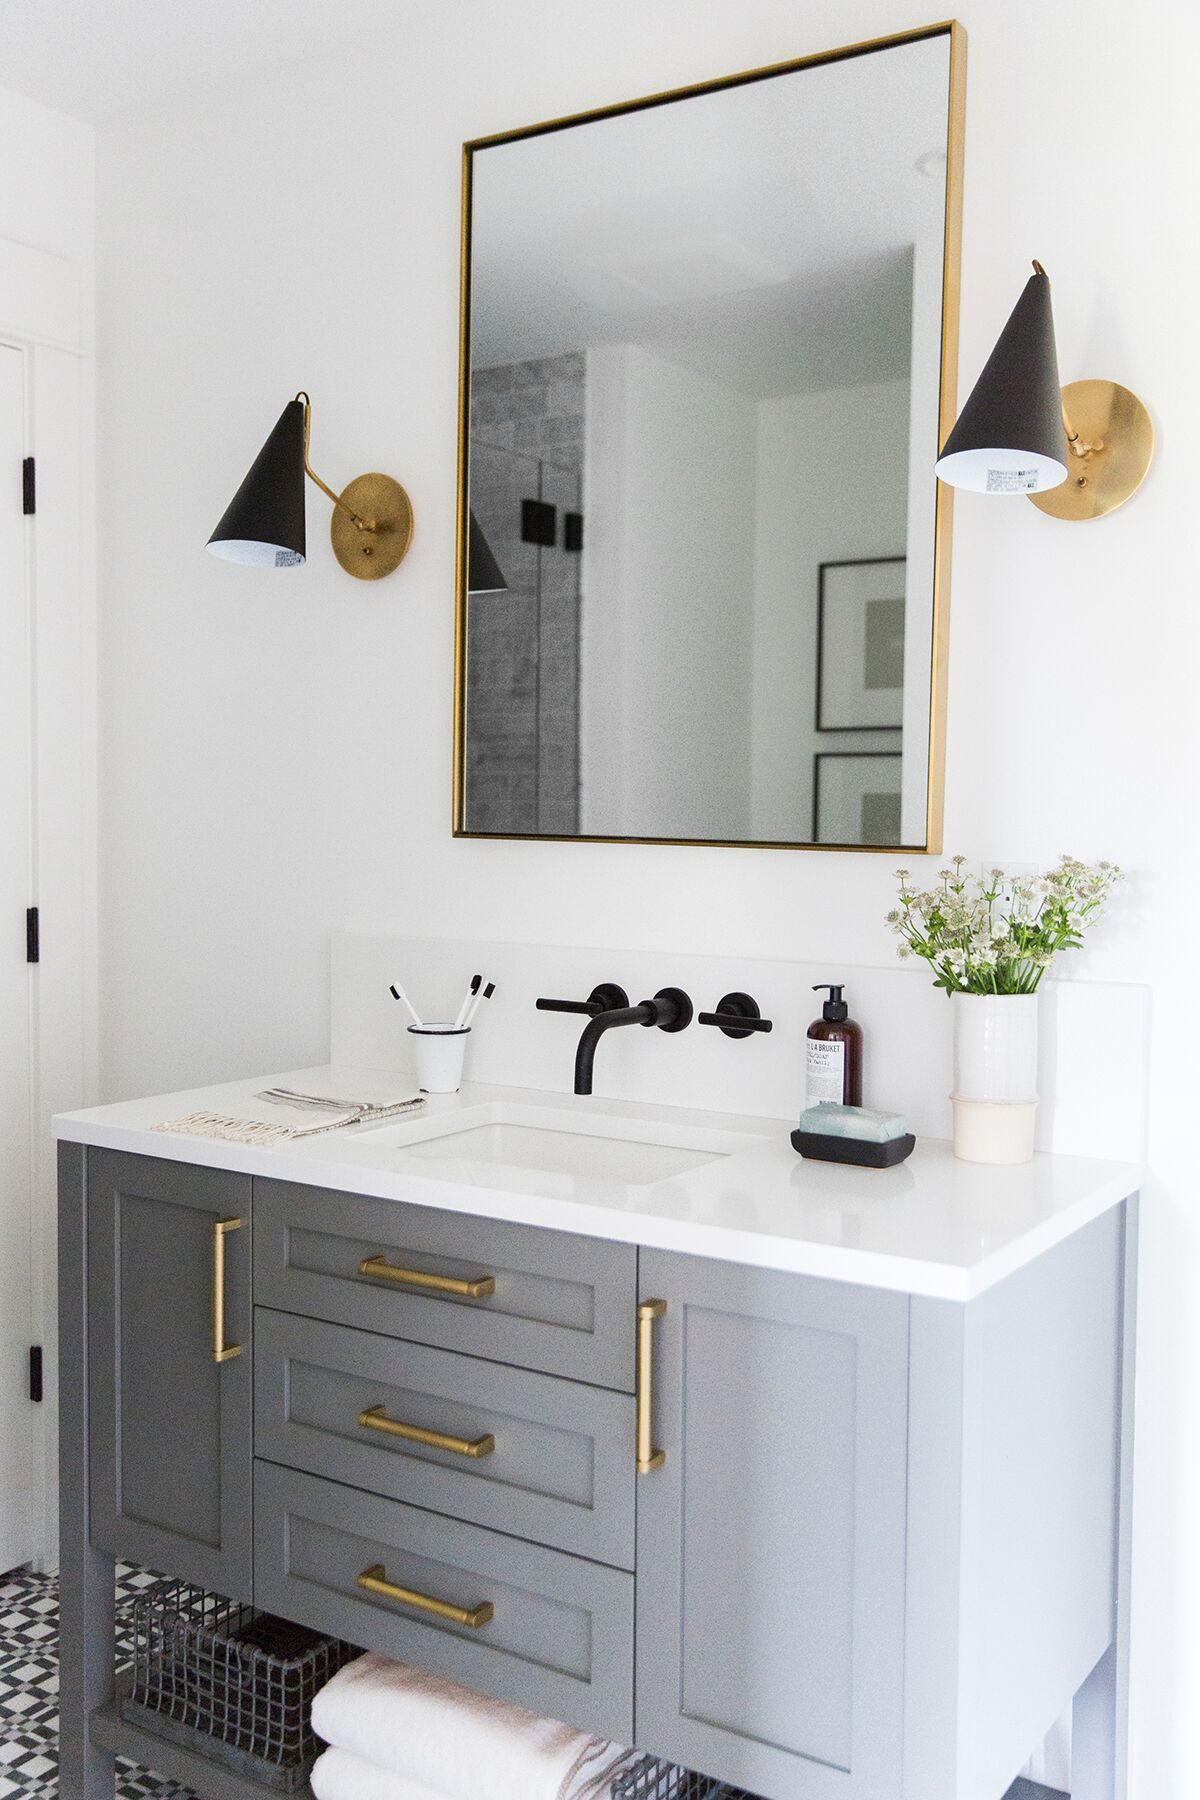 Mercer island project guest bathroom in bathroom sinks